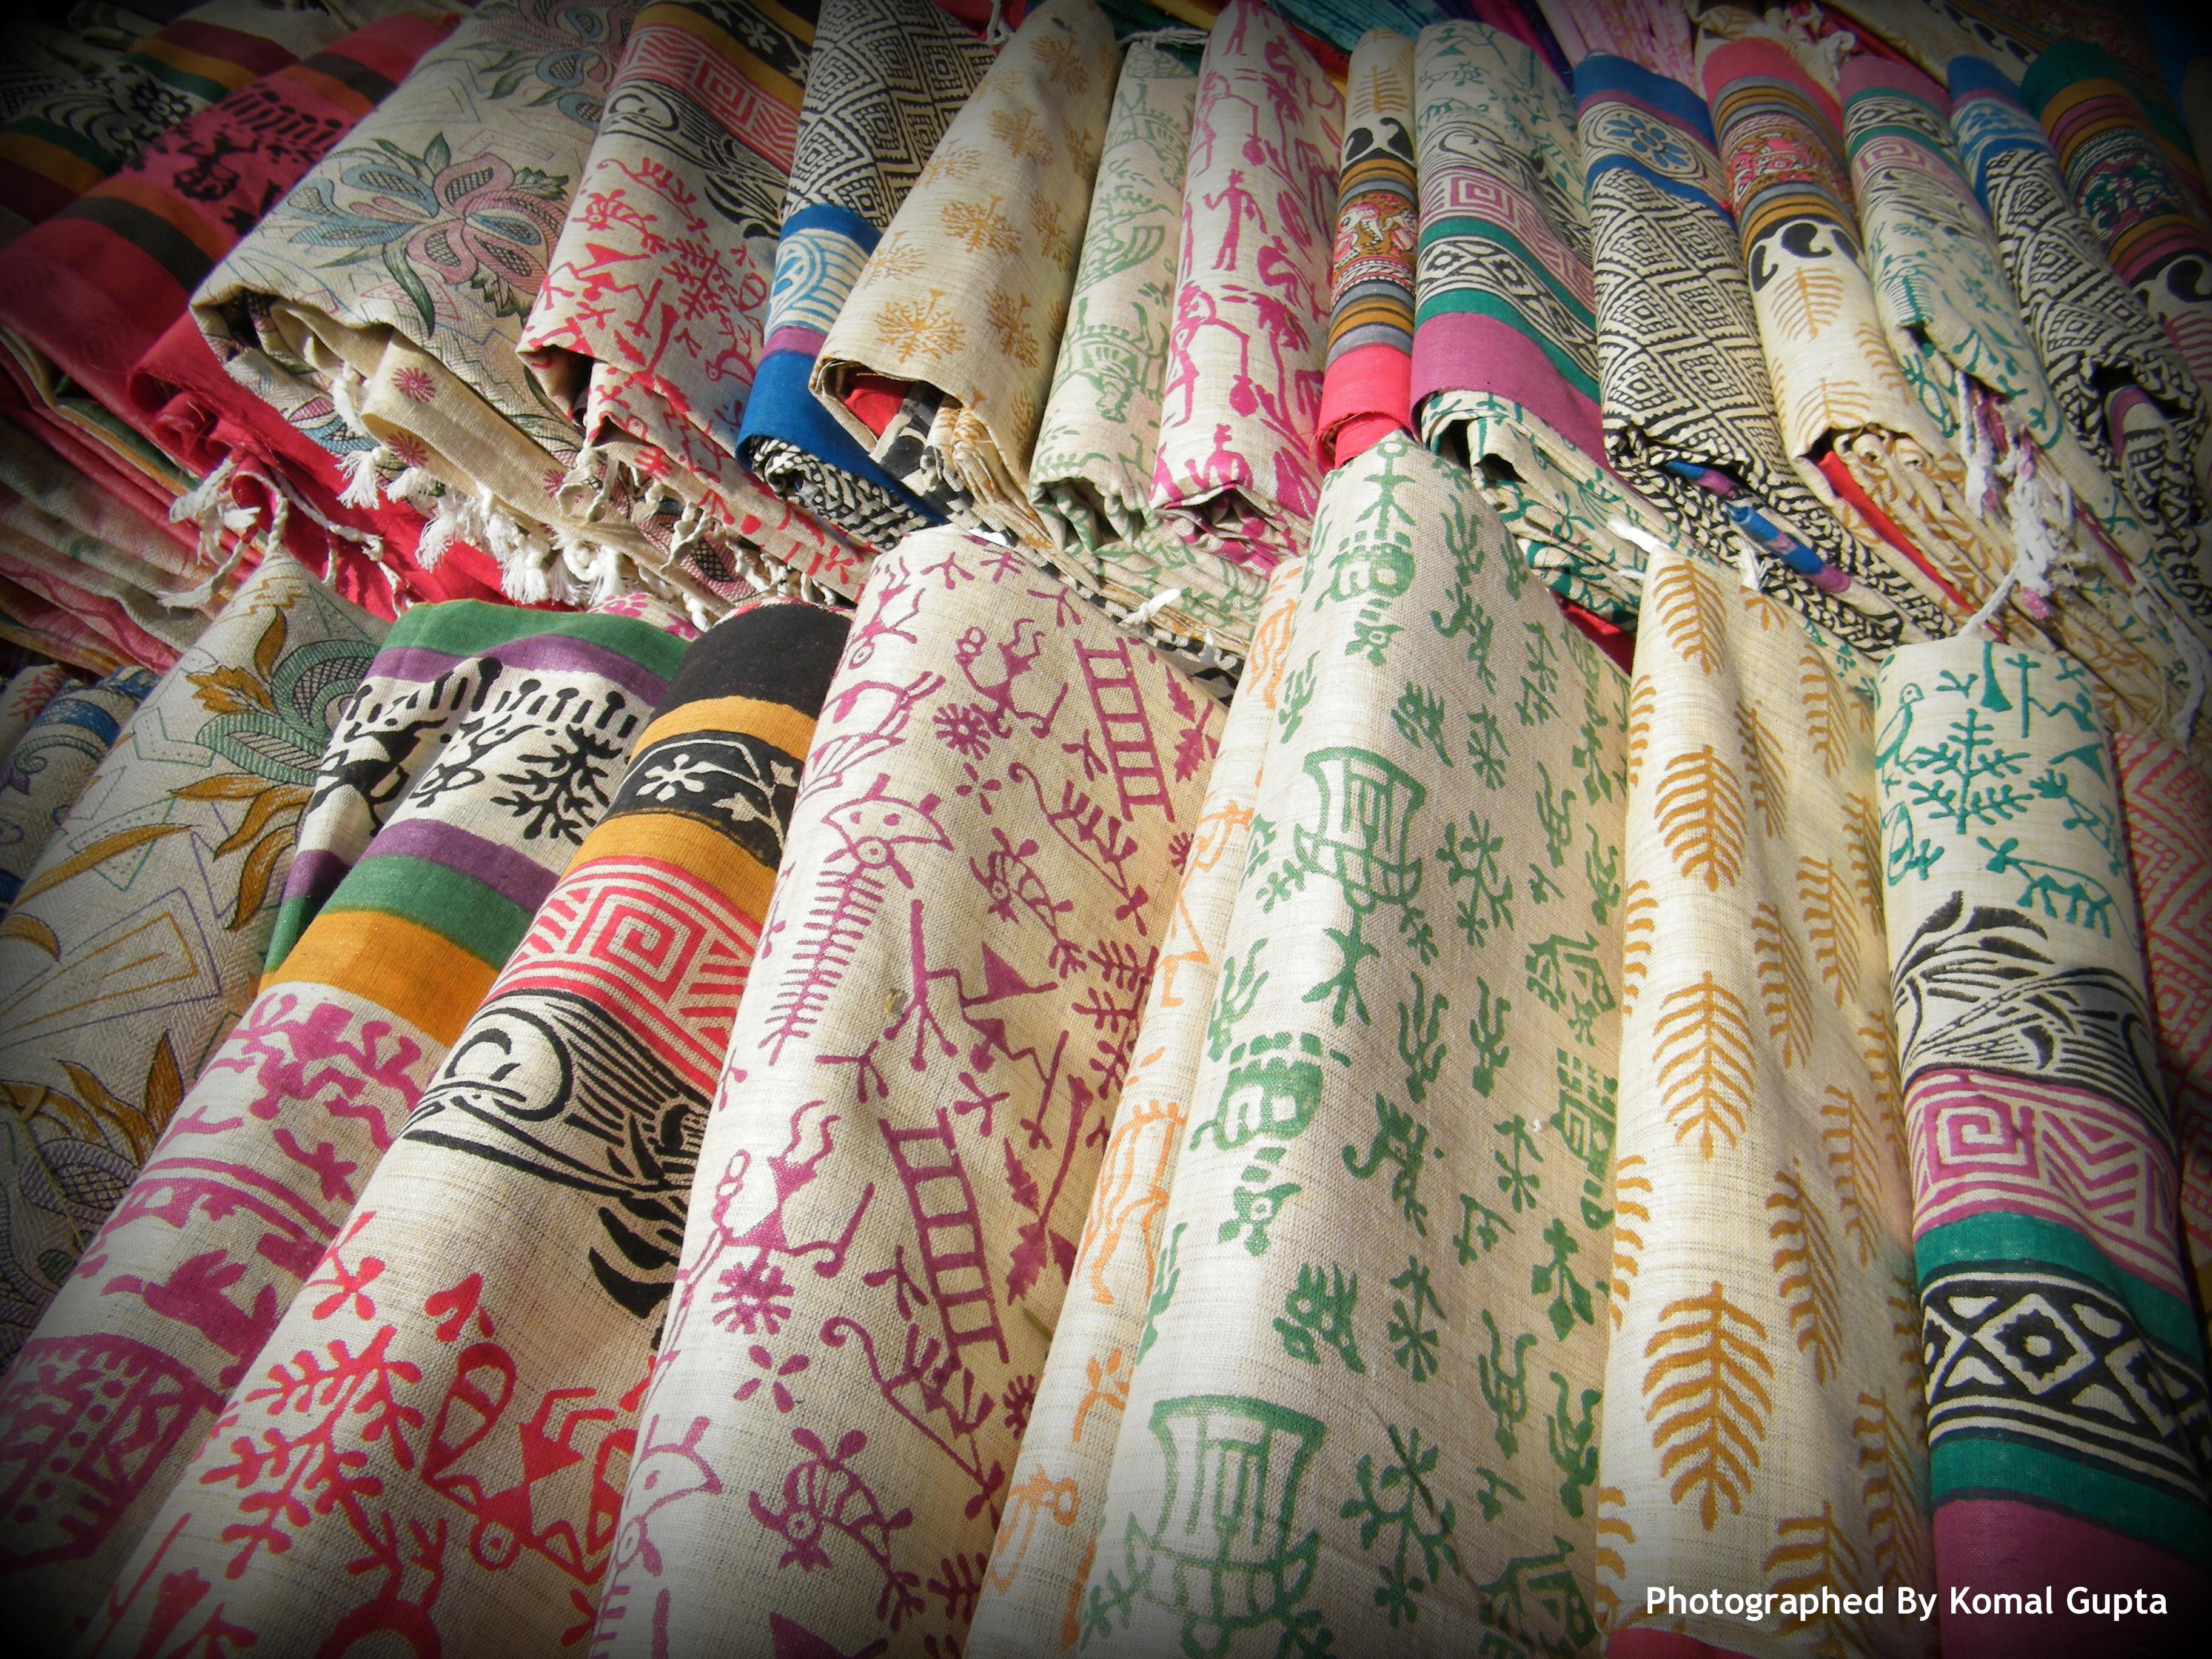 Breathing Warli Prints